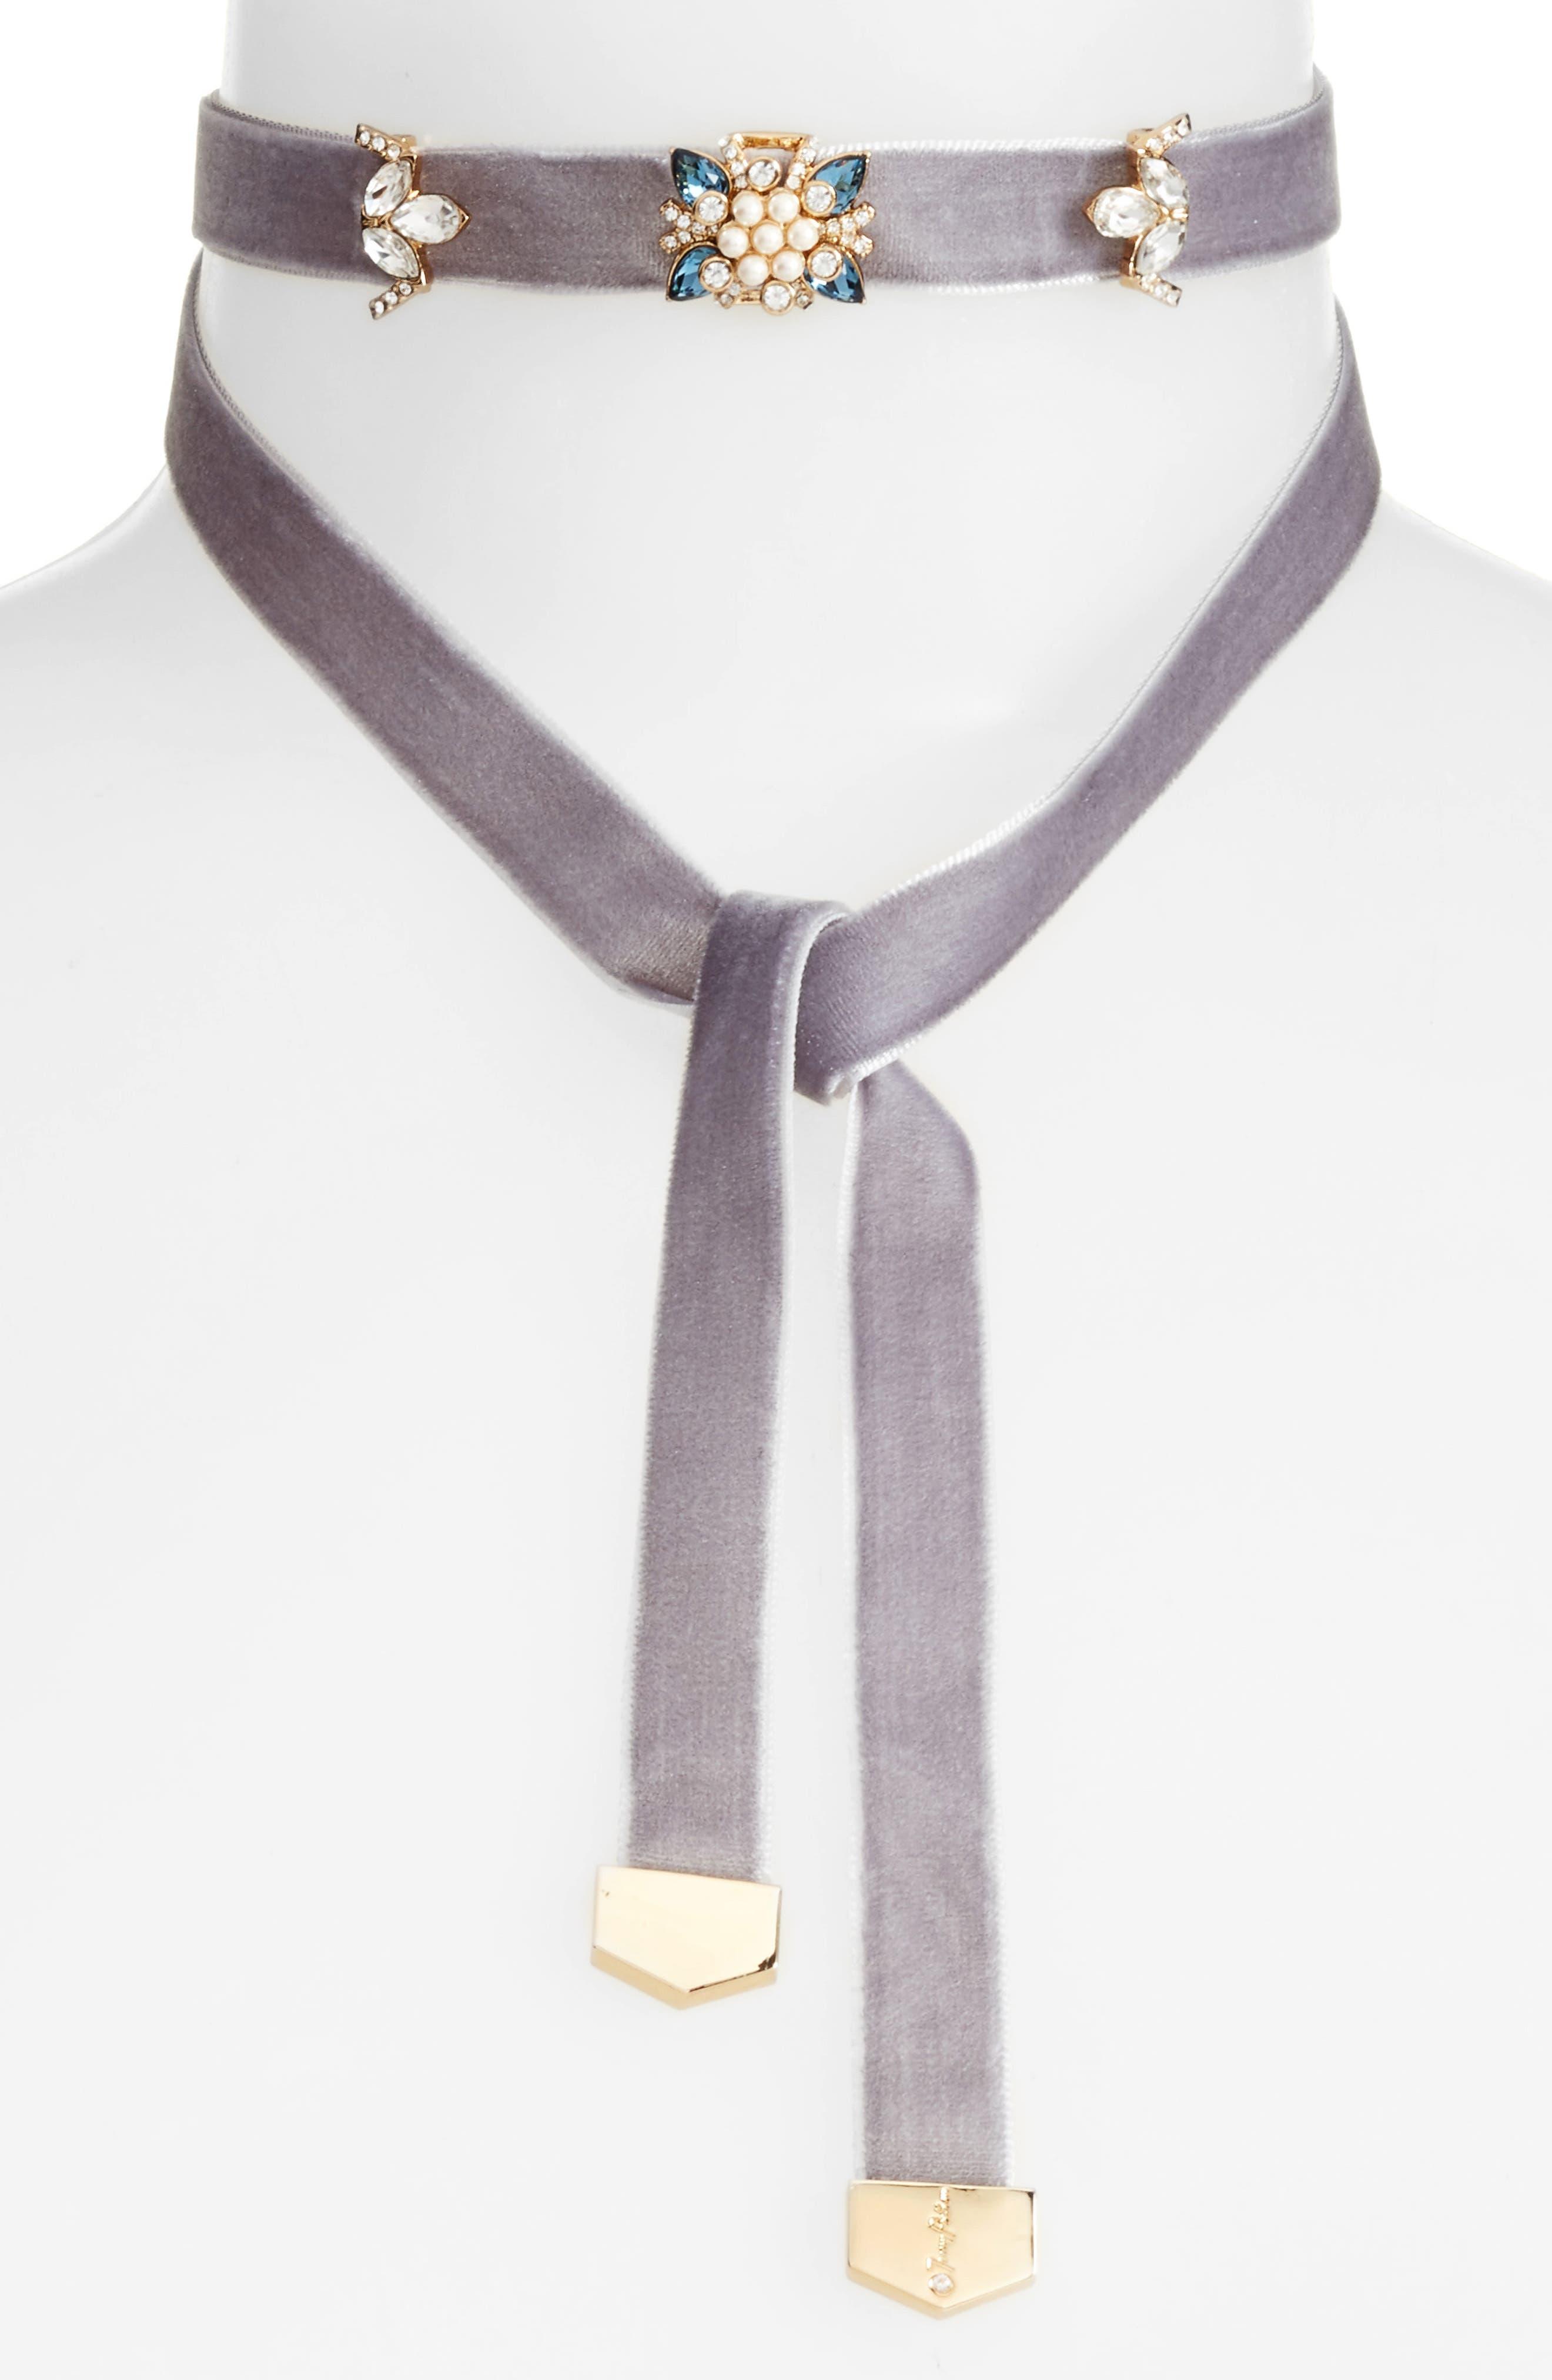 Embellished Velvet Wrap Choker Necklace,                             Main thumbnail 1, color,                             GREY/ GOLD